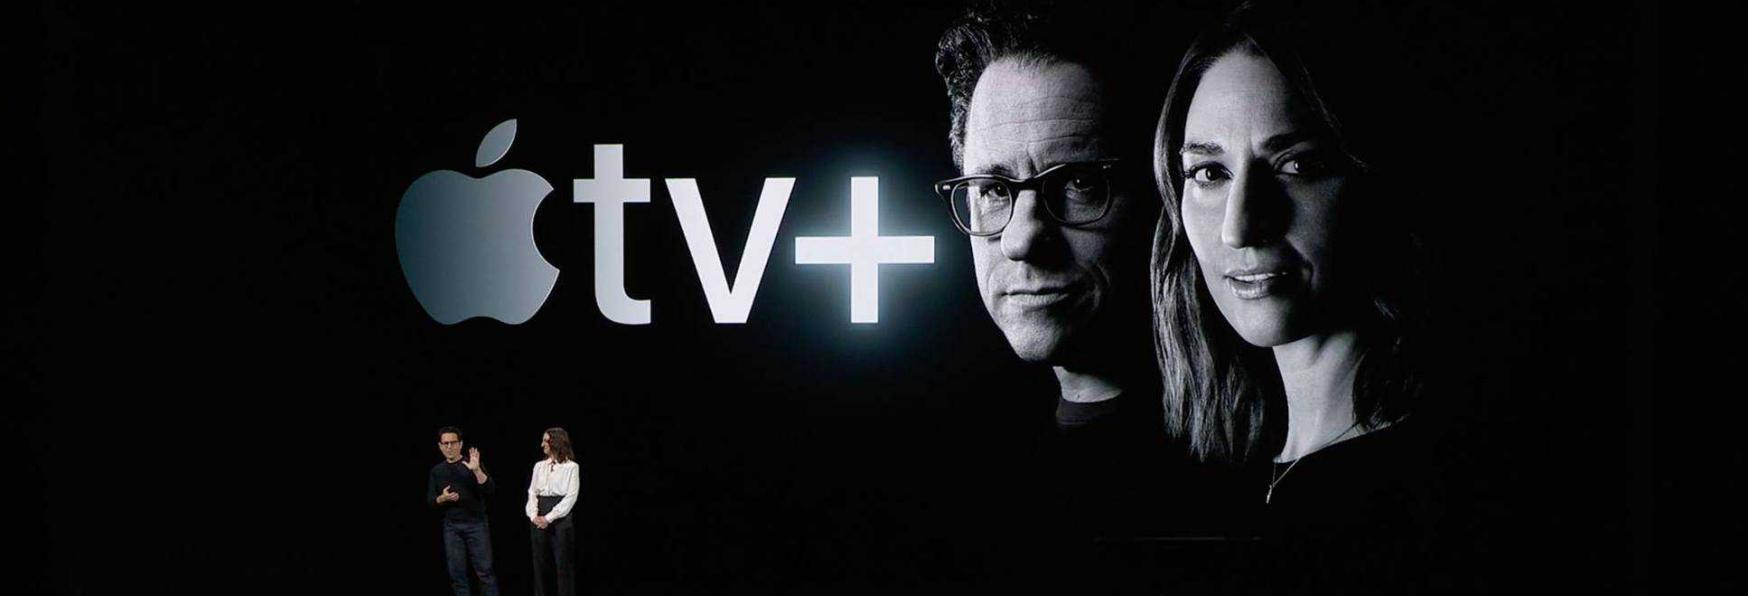 Little Voice: Online il Teaser Trailer della nuova Serie TV targata Apple